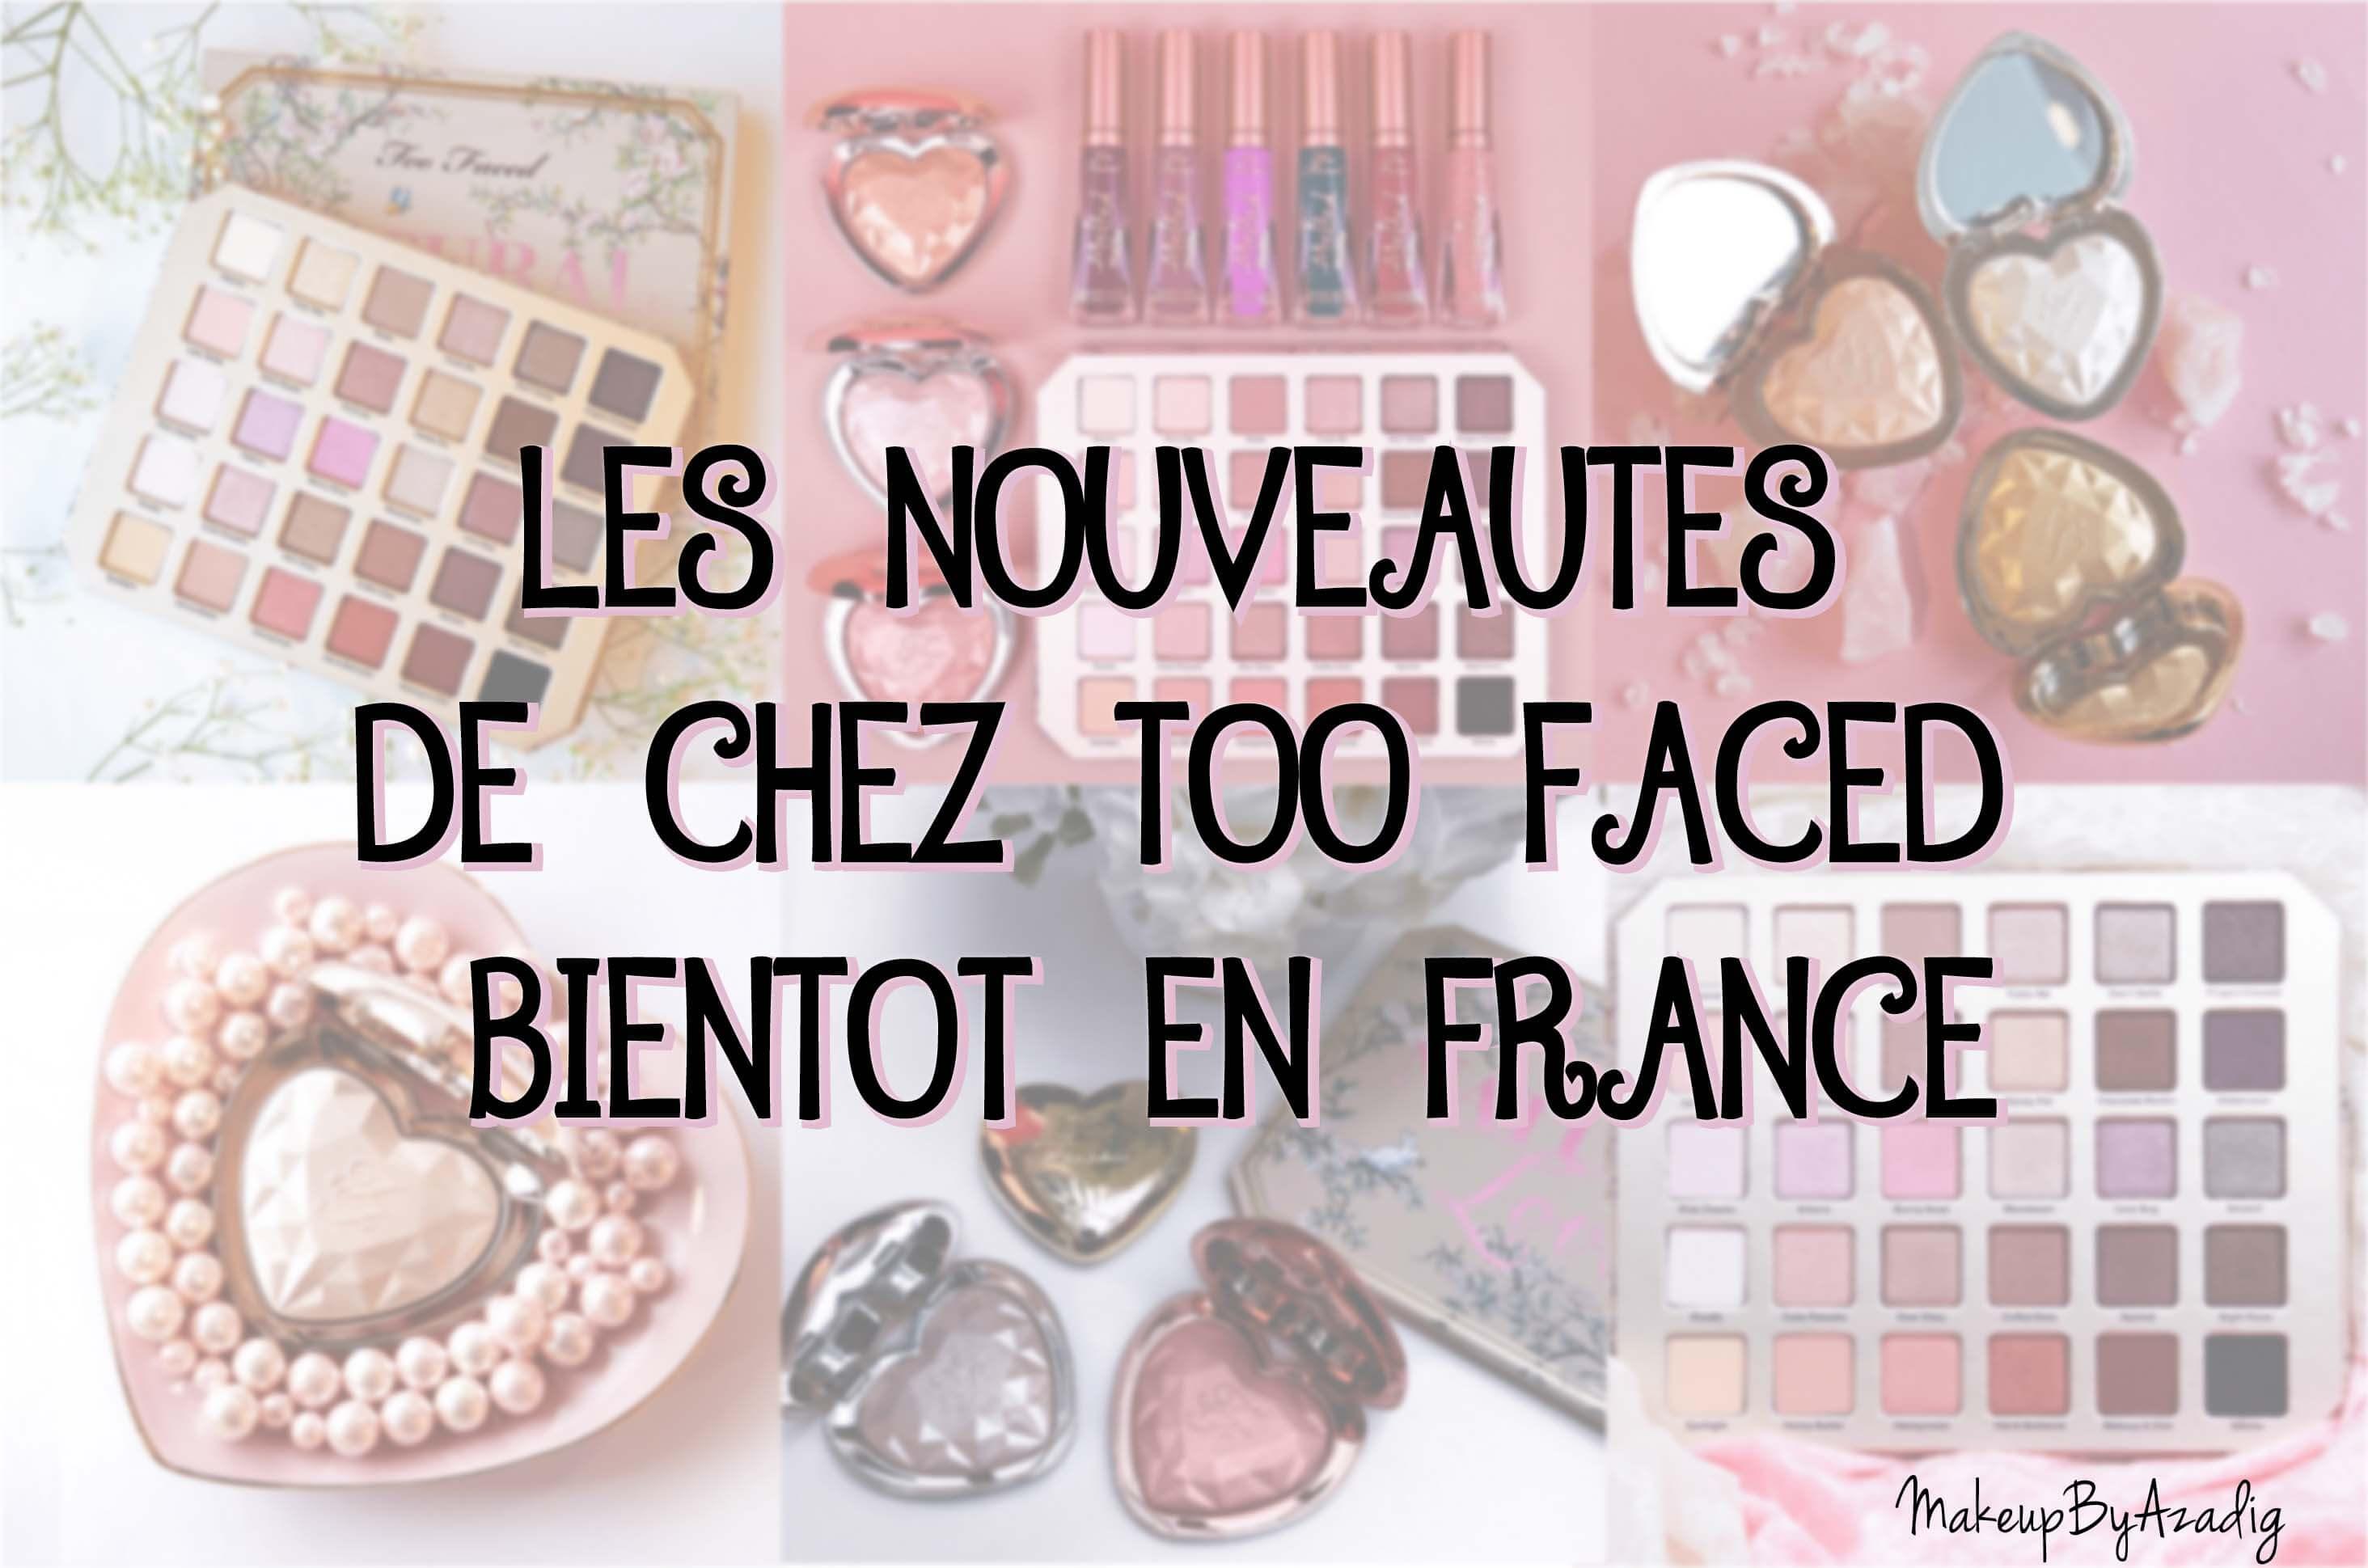 nouveautes-too-faced-palette-natural-love-love-light-highlighters-coeur-sephora-date-sortie-makeupbyazadig-paris-champs-elysees-swatch-avis-prix-revue-enlumineur